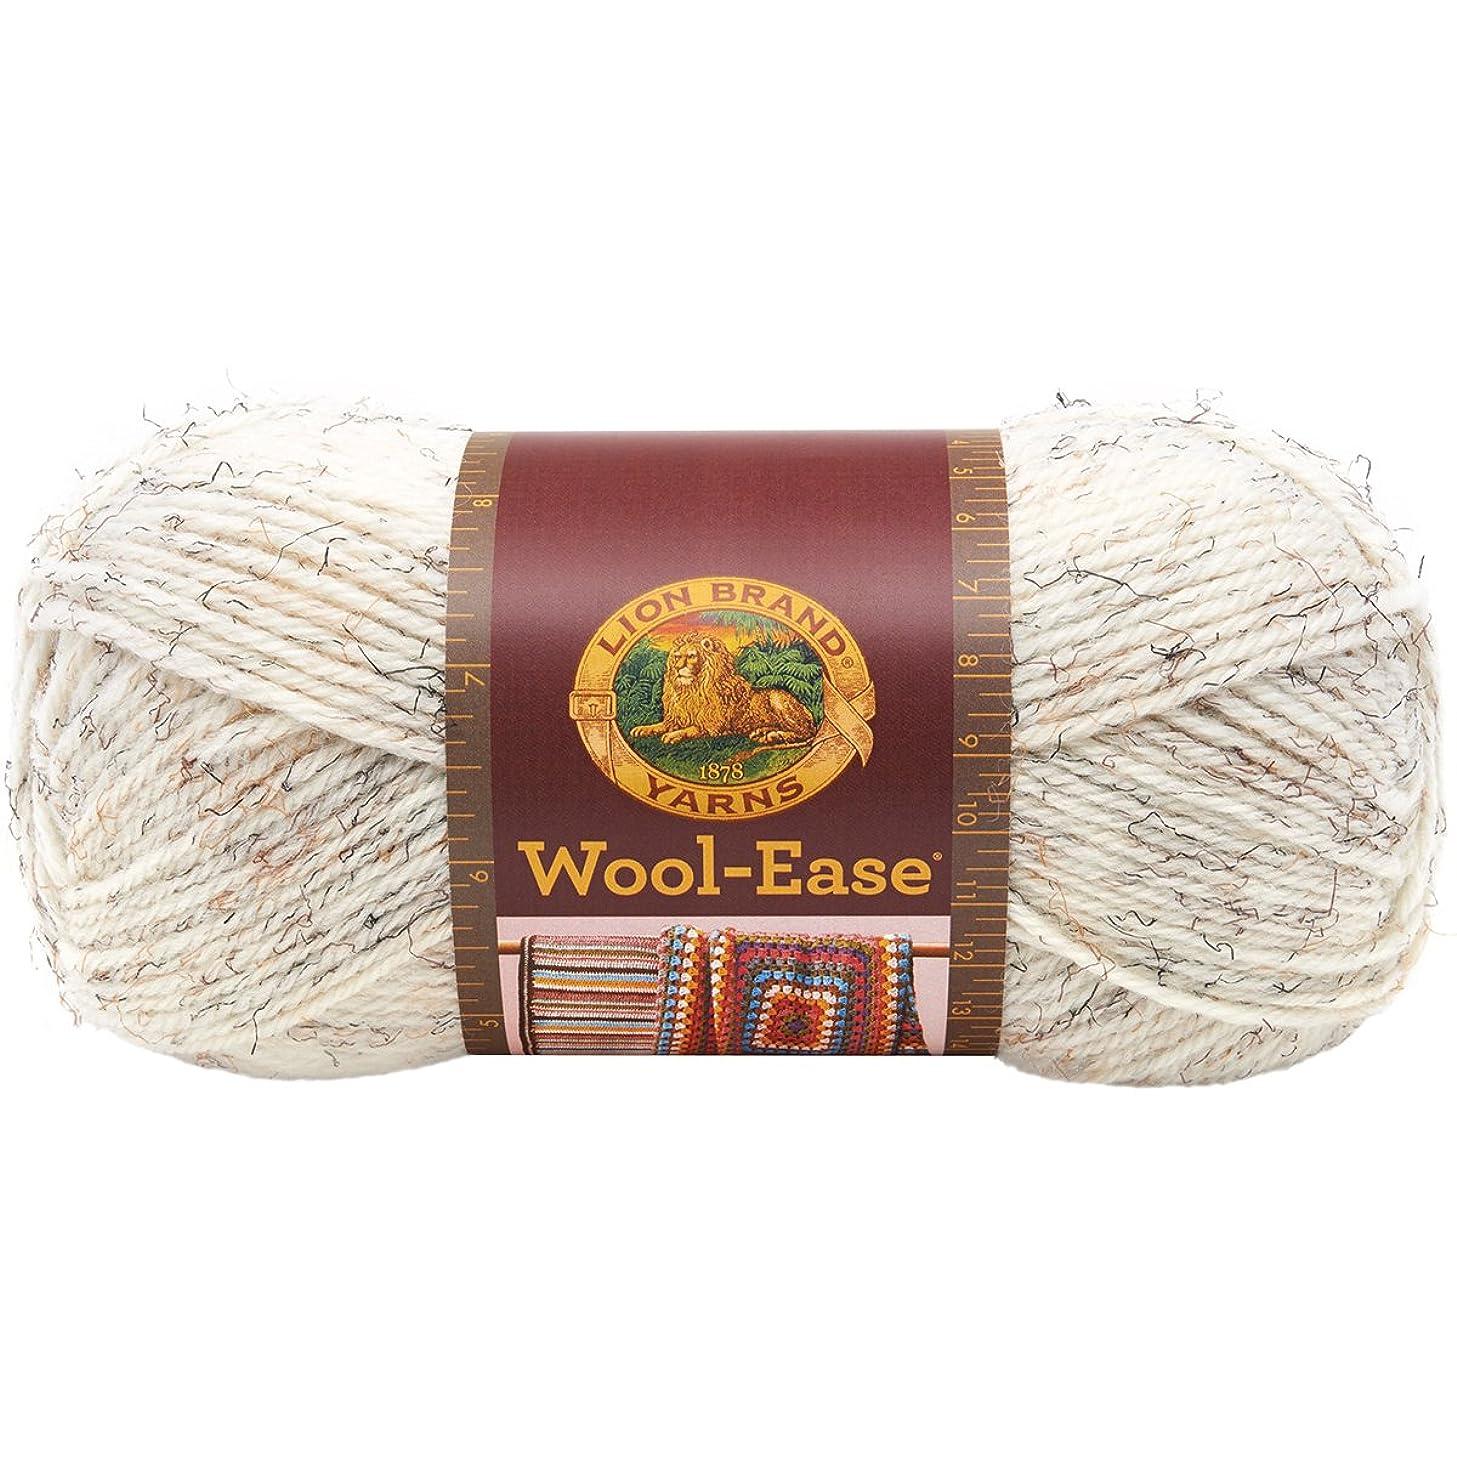 Lion Brand Yarn Lion Brand Wool-Ease Yarn (402) Wheat,